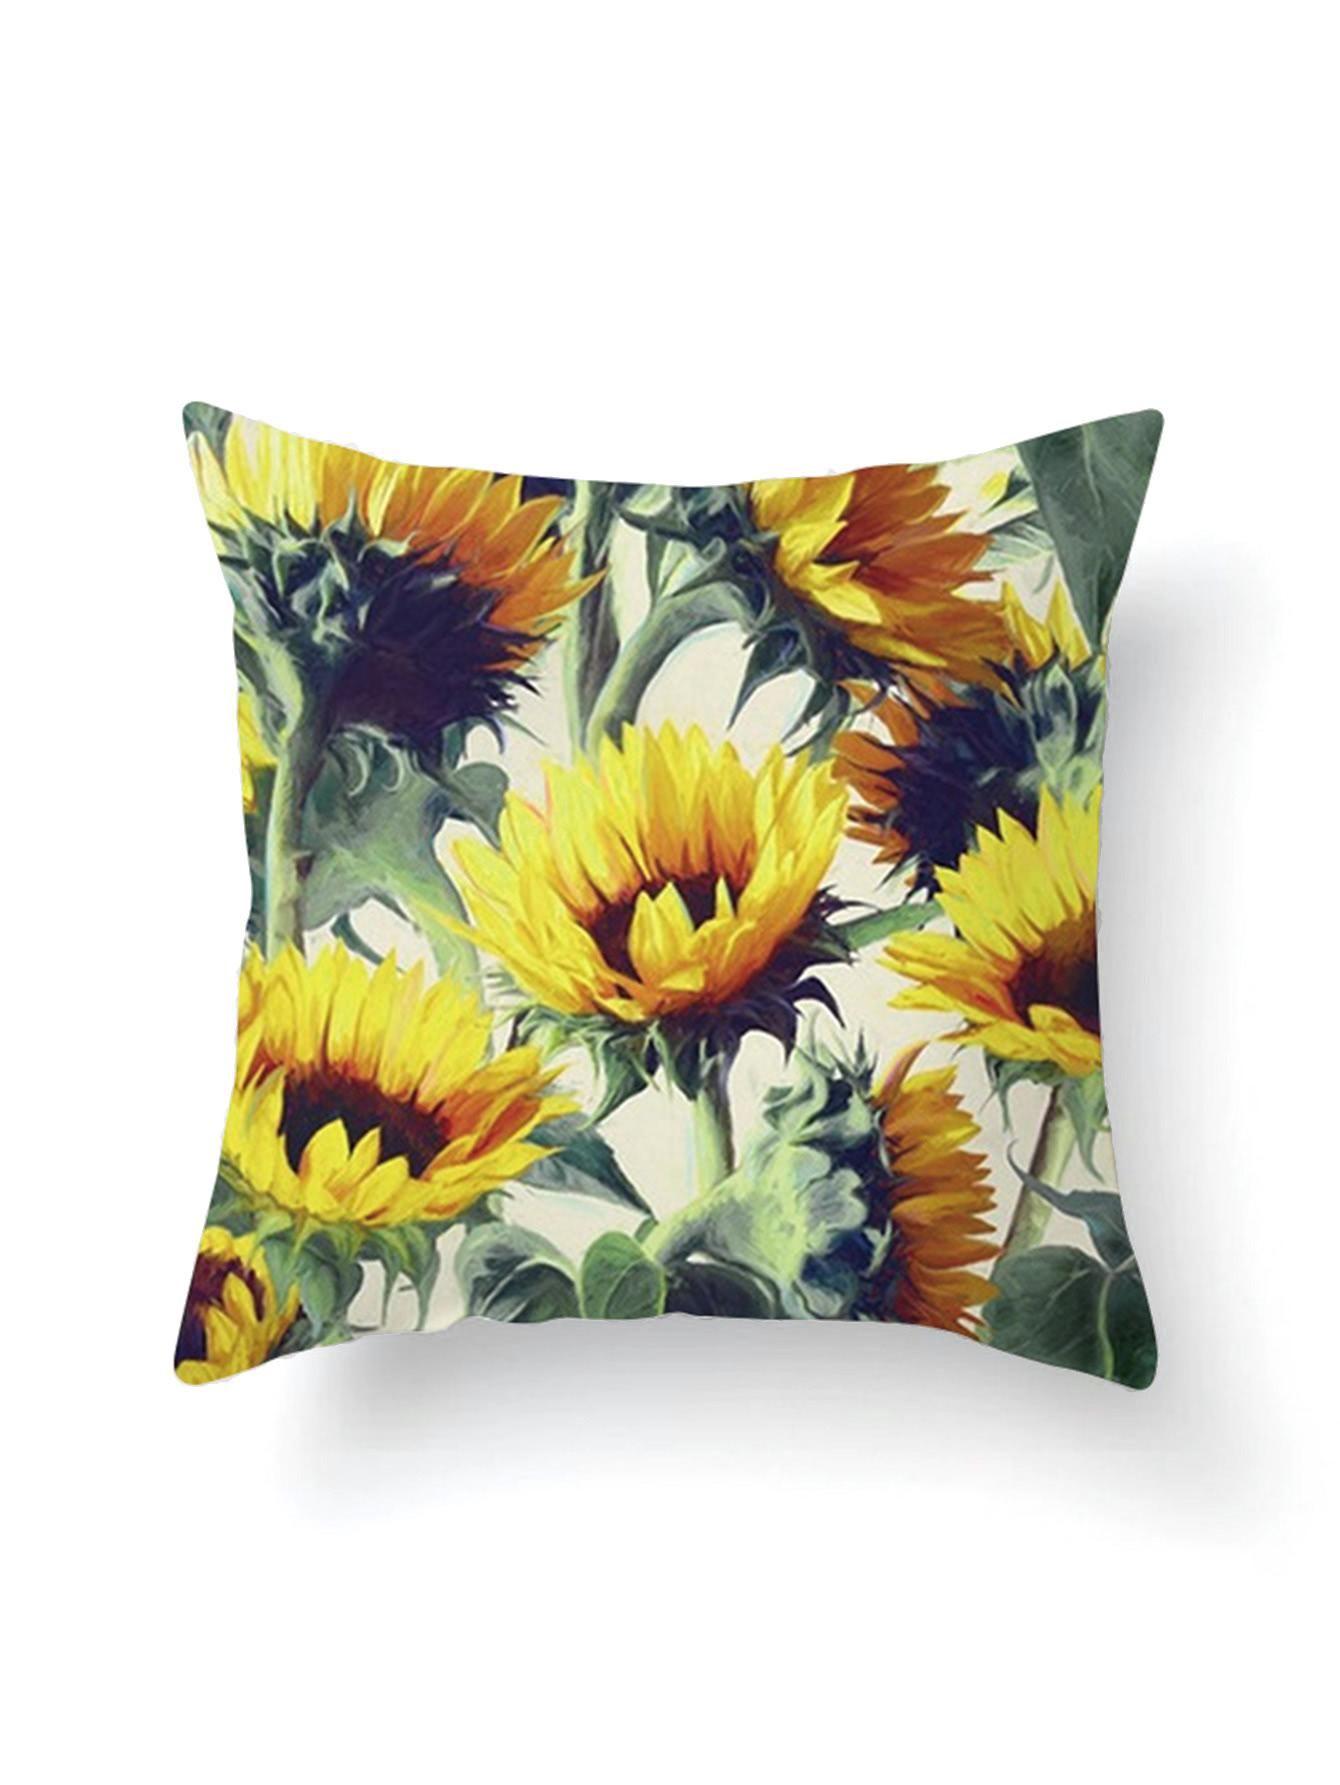 Shein  Shein Sunflower Print Pillowcase Cover  Adorewecom